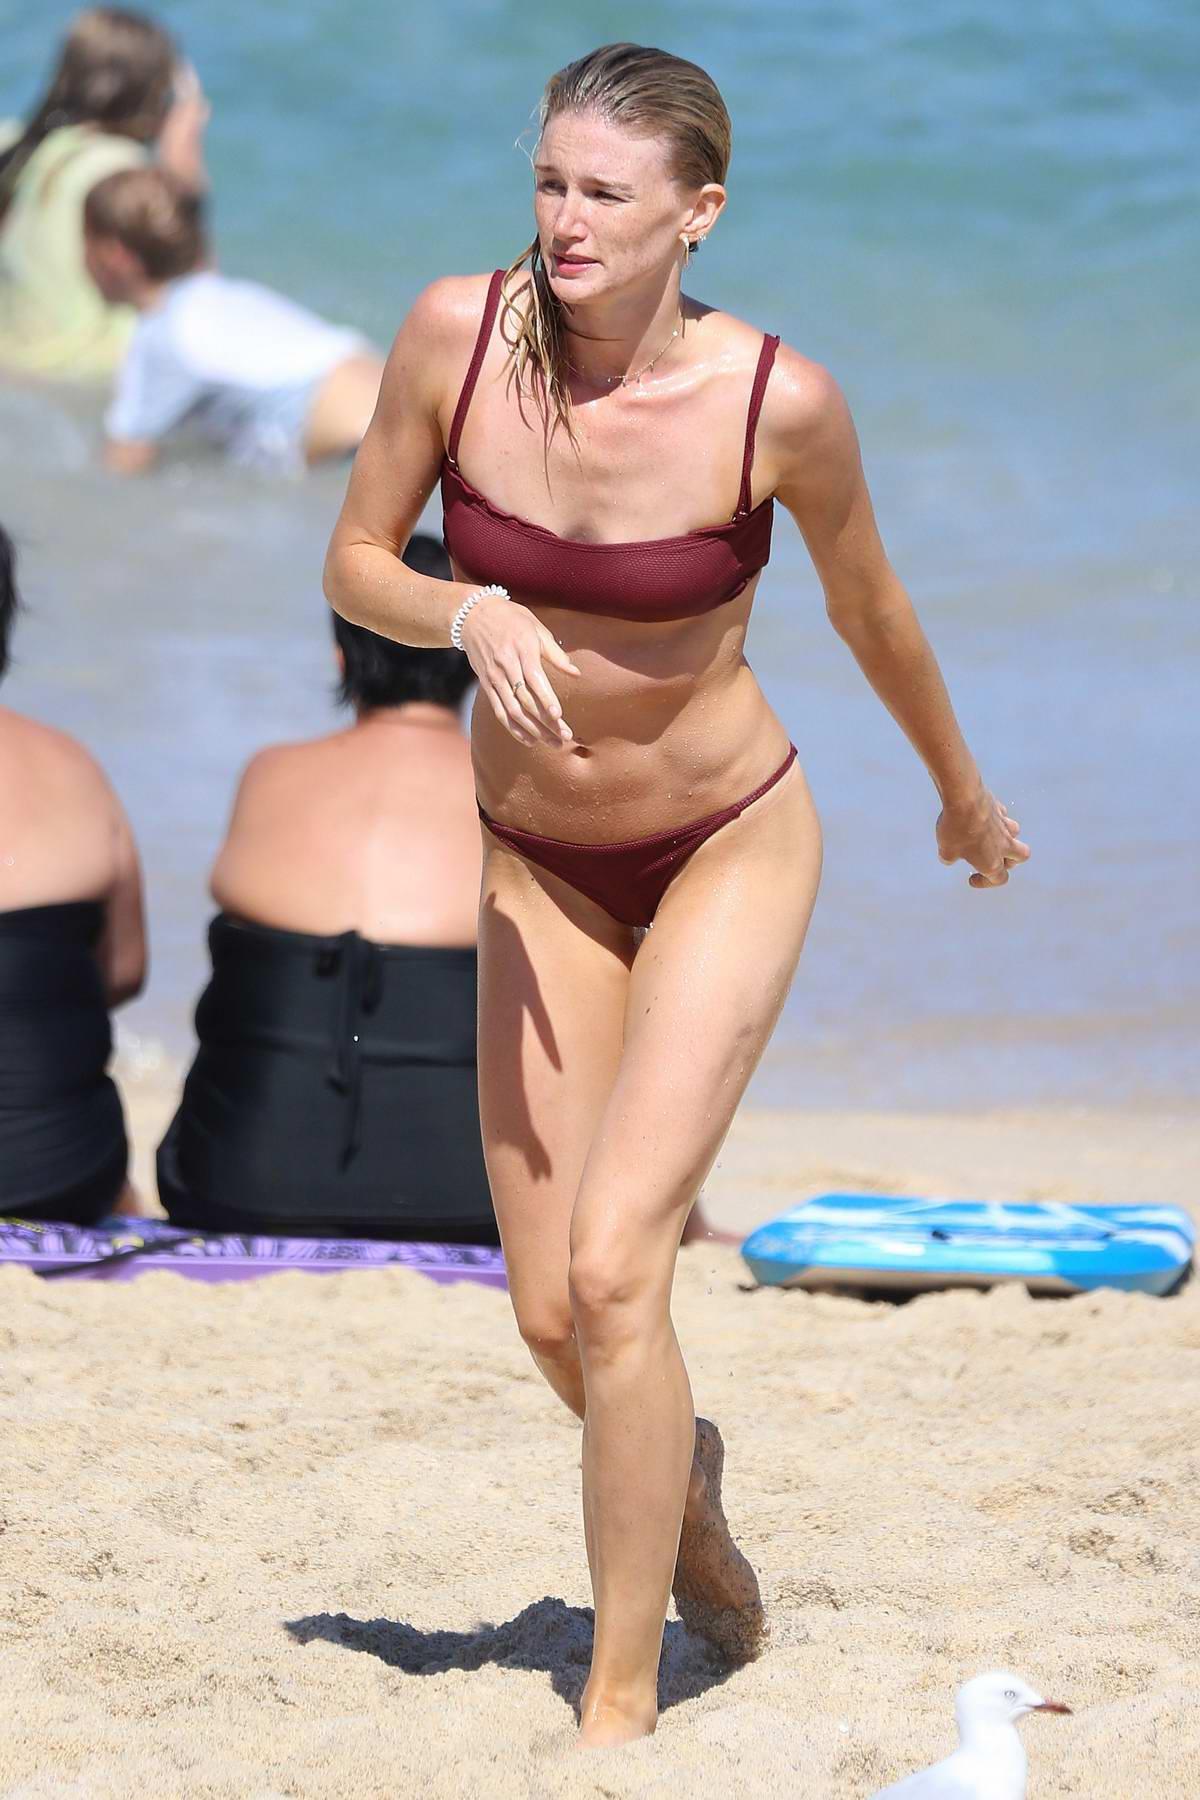 Amy Pejkovic rocks a bikini as she goes for a swim at Bronte beach in Sydney, Australia